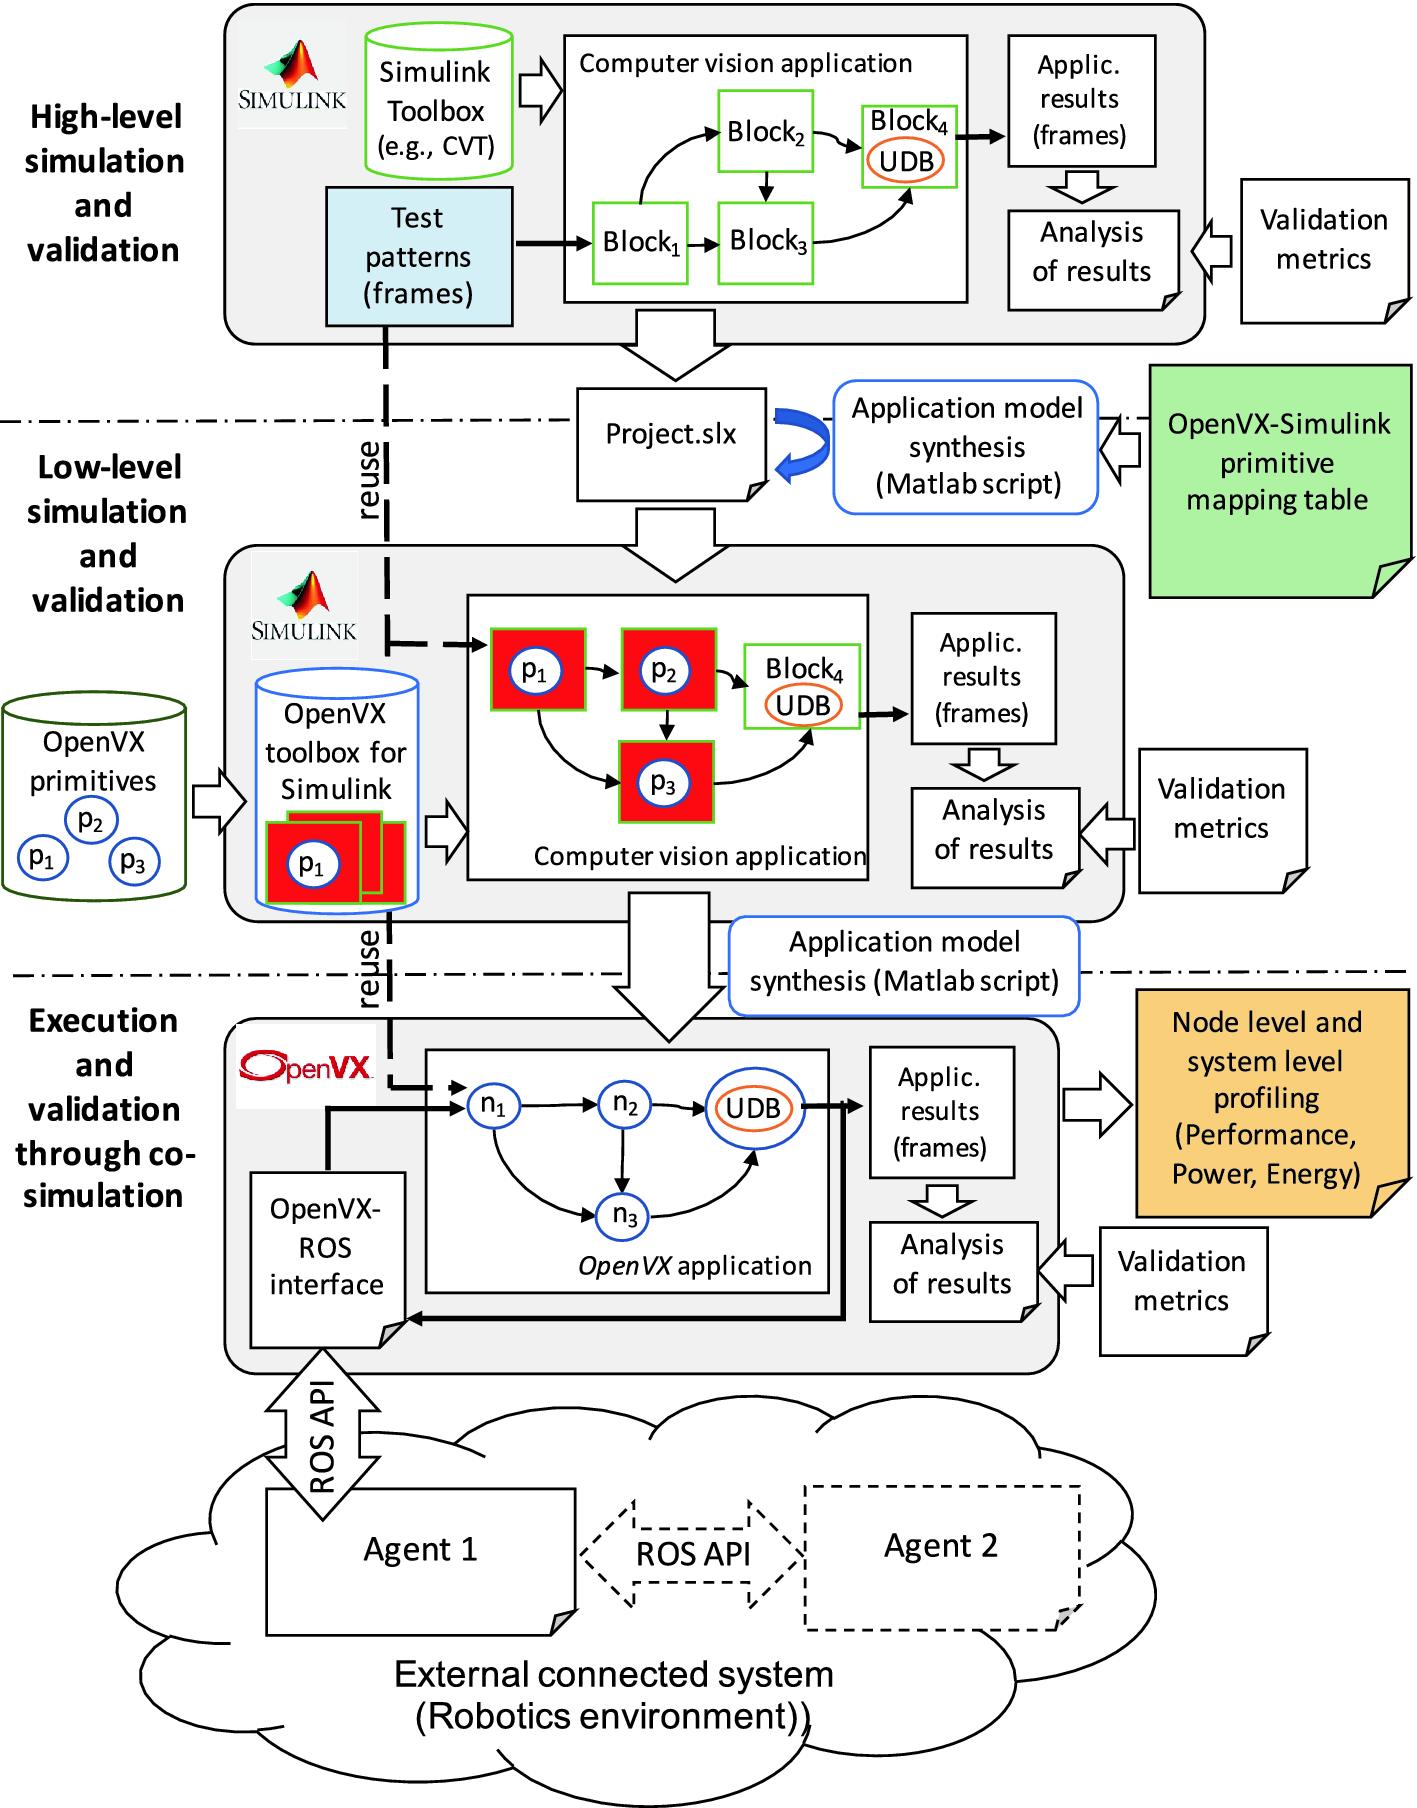 Integrating Simulink, OpenVX, and ROS for Model-Based Design of